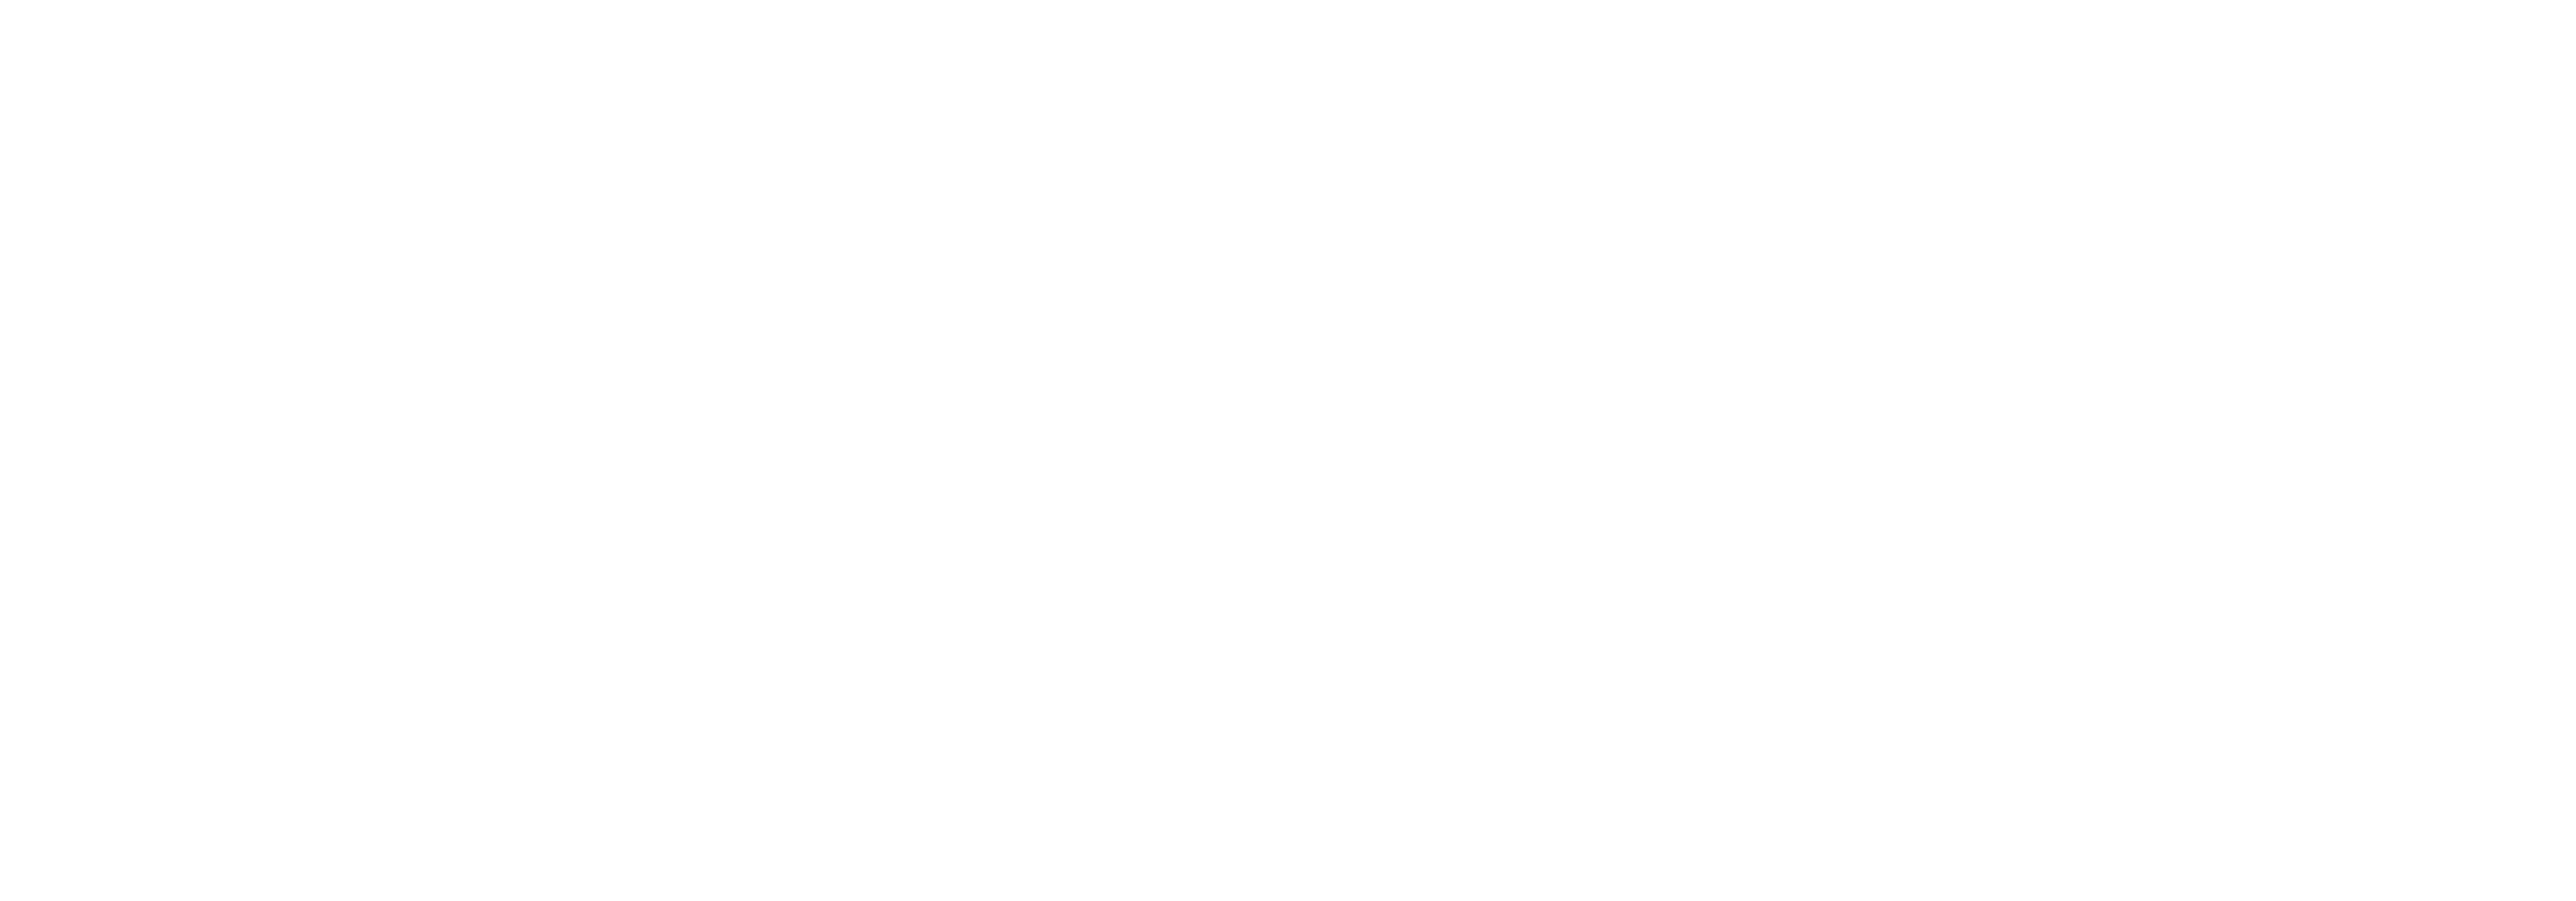 Edelweiss Alpine Ski Club